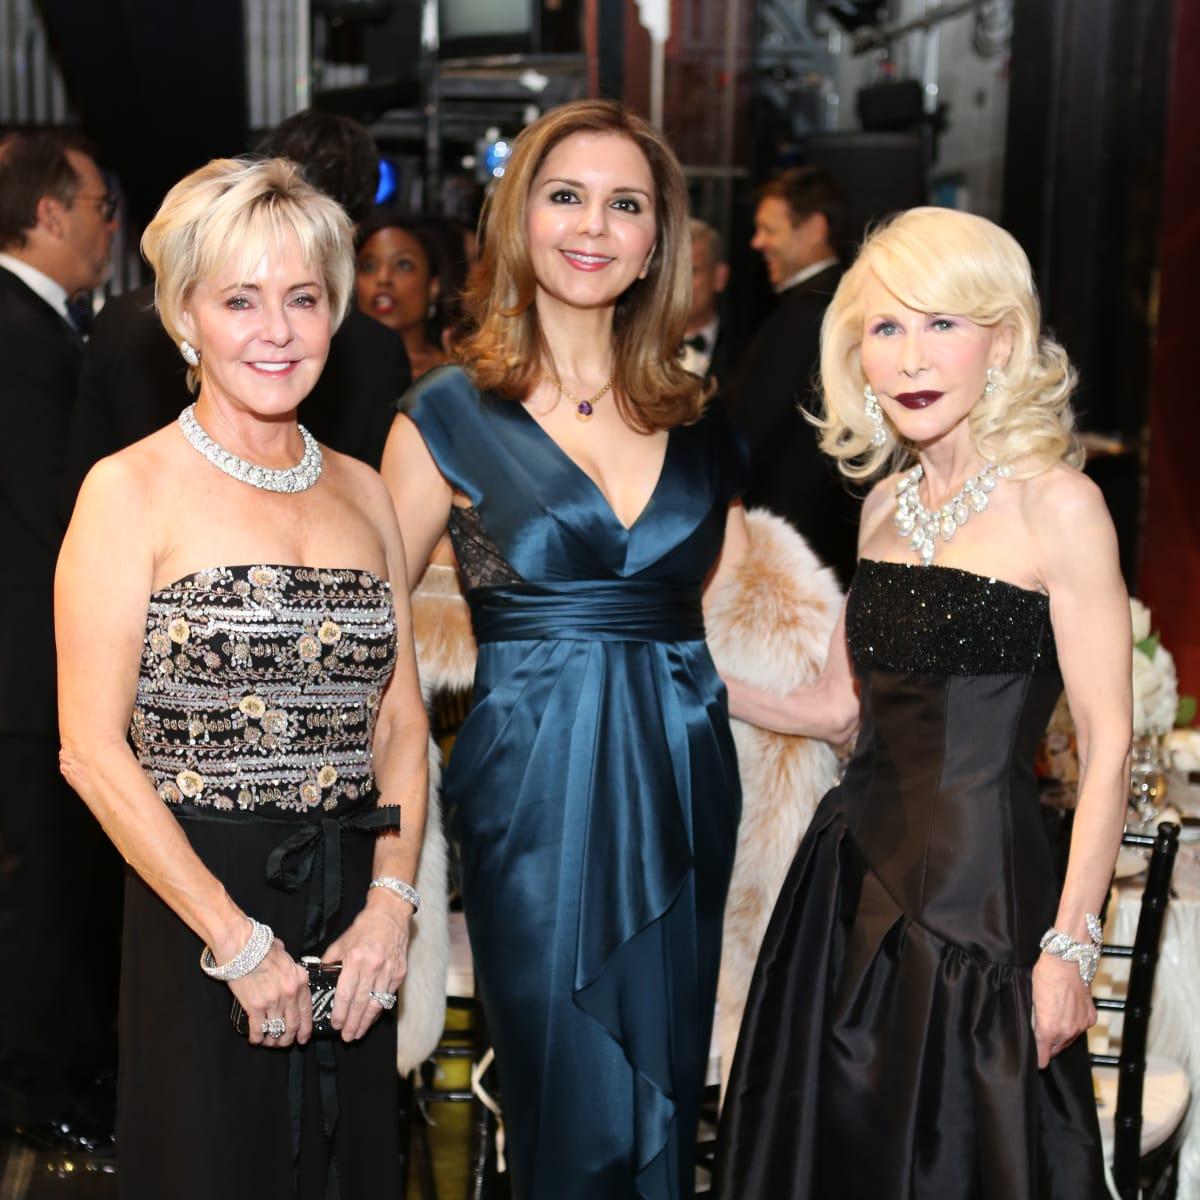 Mercury Gala, April 2016, Karen Mayell, Sally Moon Benz, Diane Lokey Farb